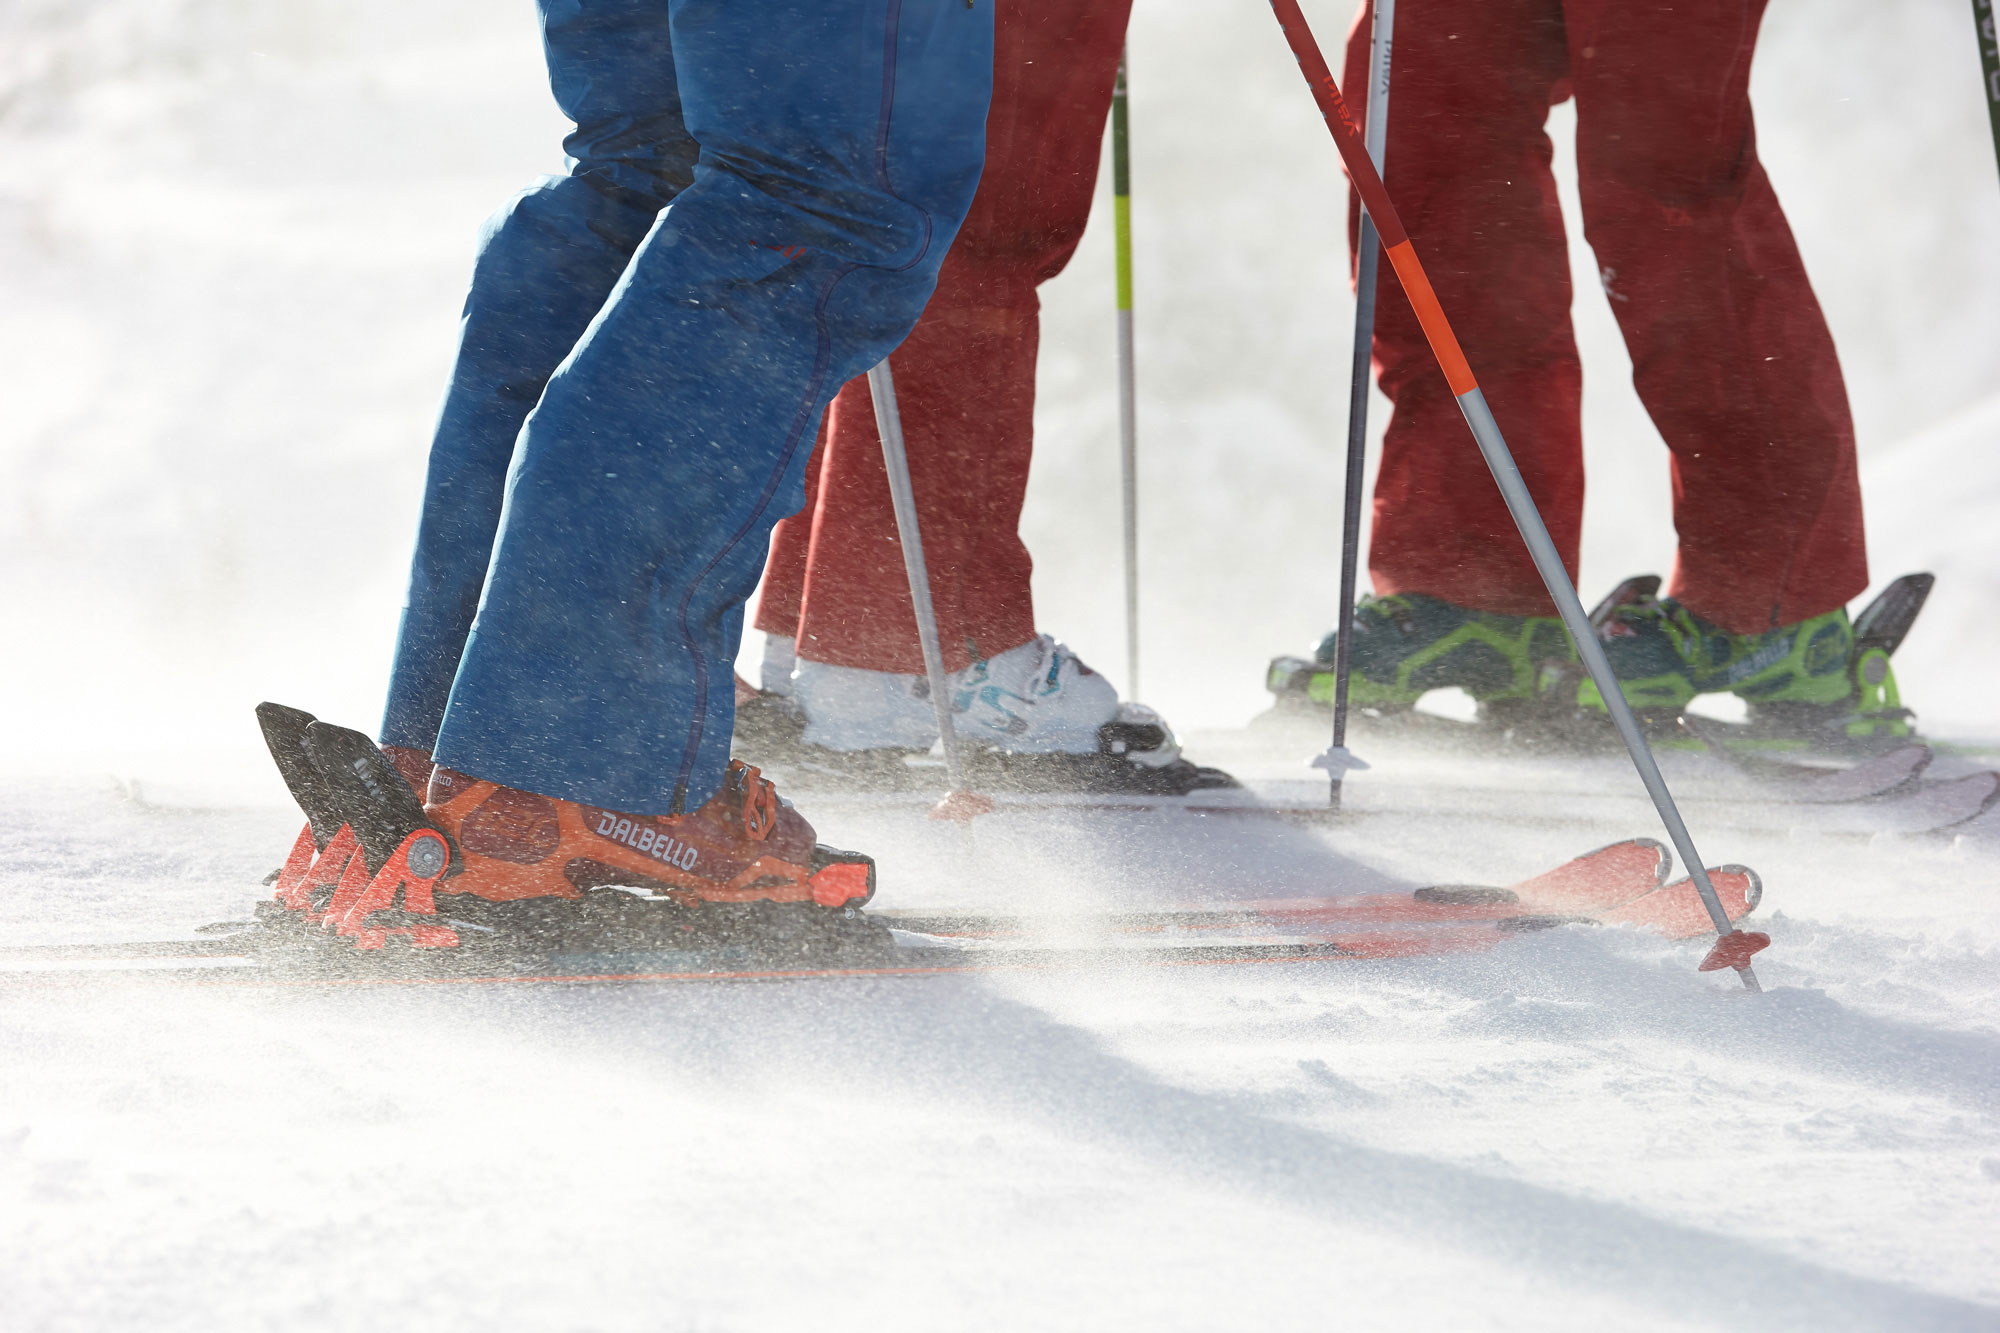 Ski Closeup with Dalbello Ski Boot